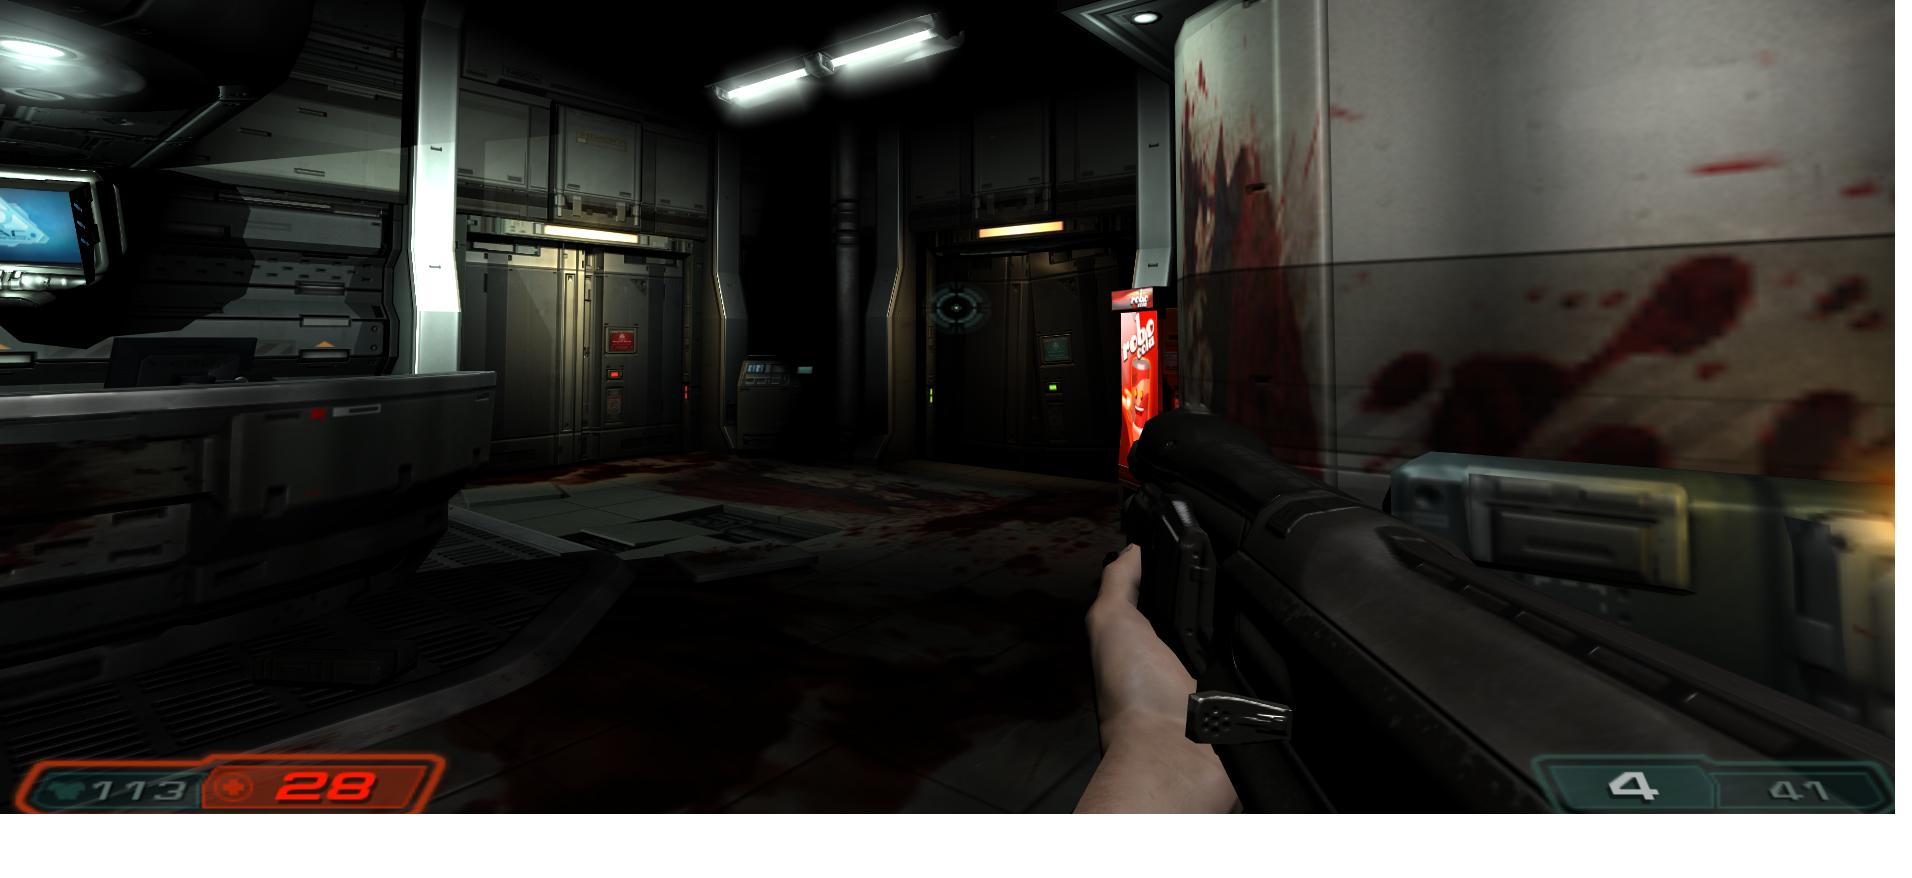 doom full res - How To Get Doom 3 To Work On Windows 10